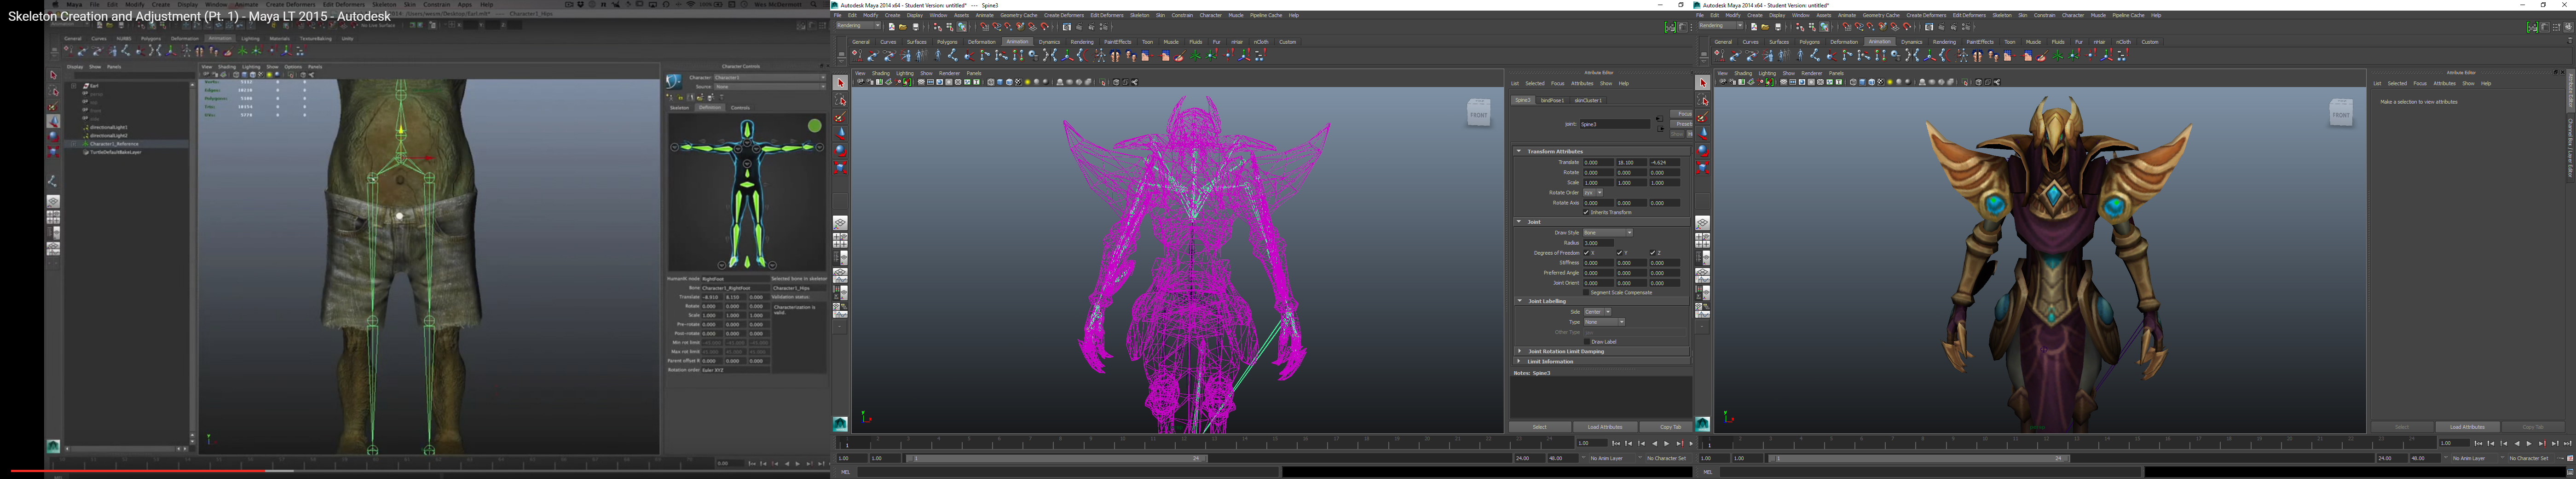 Maya Skeleton Cant see it through model - Autodesk Community